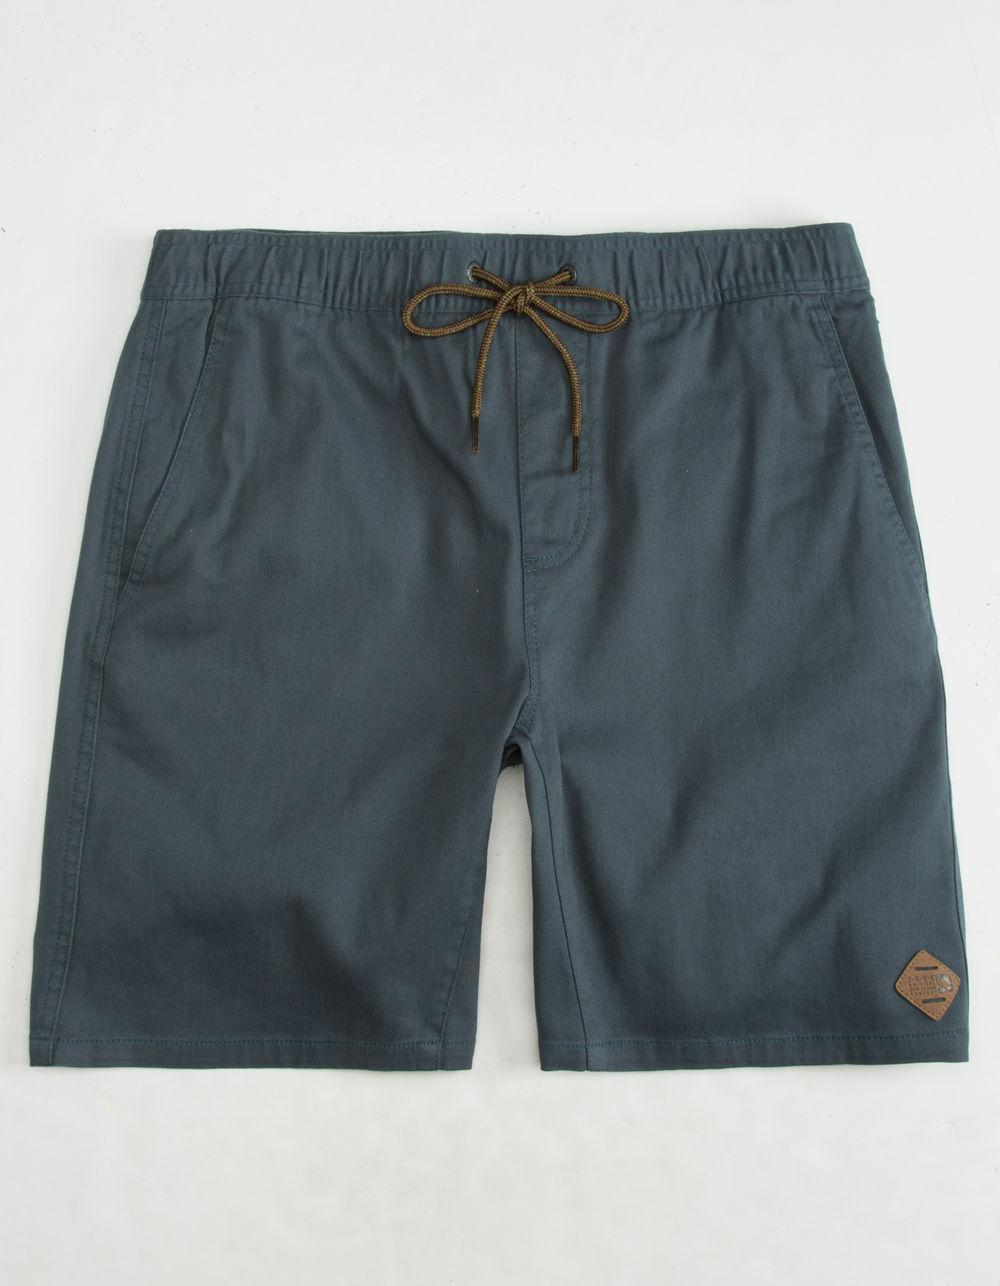 Lyst - HippyTree Crag Mens Shorts in Blue for Men e7899052dfab